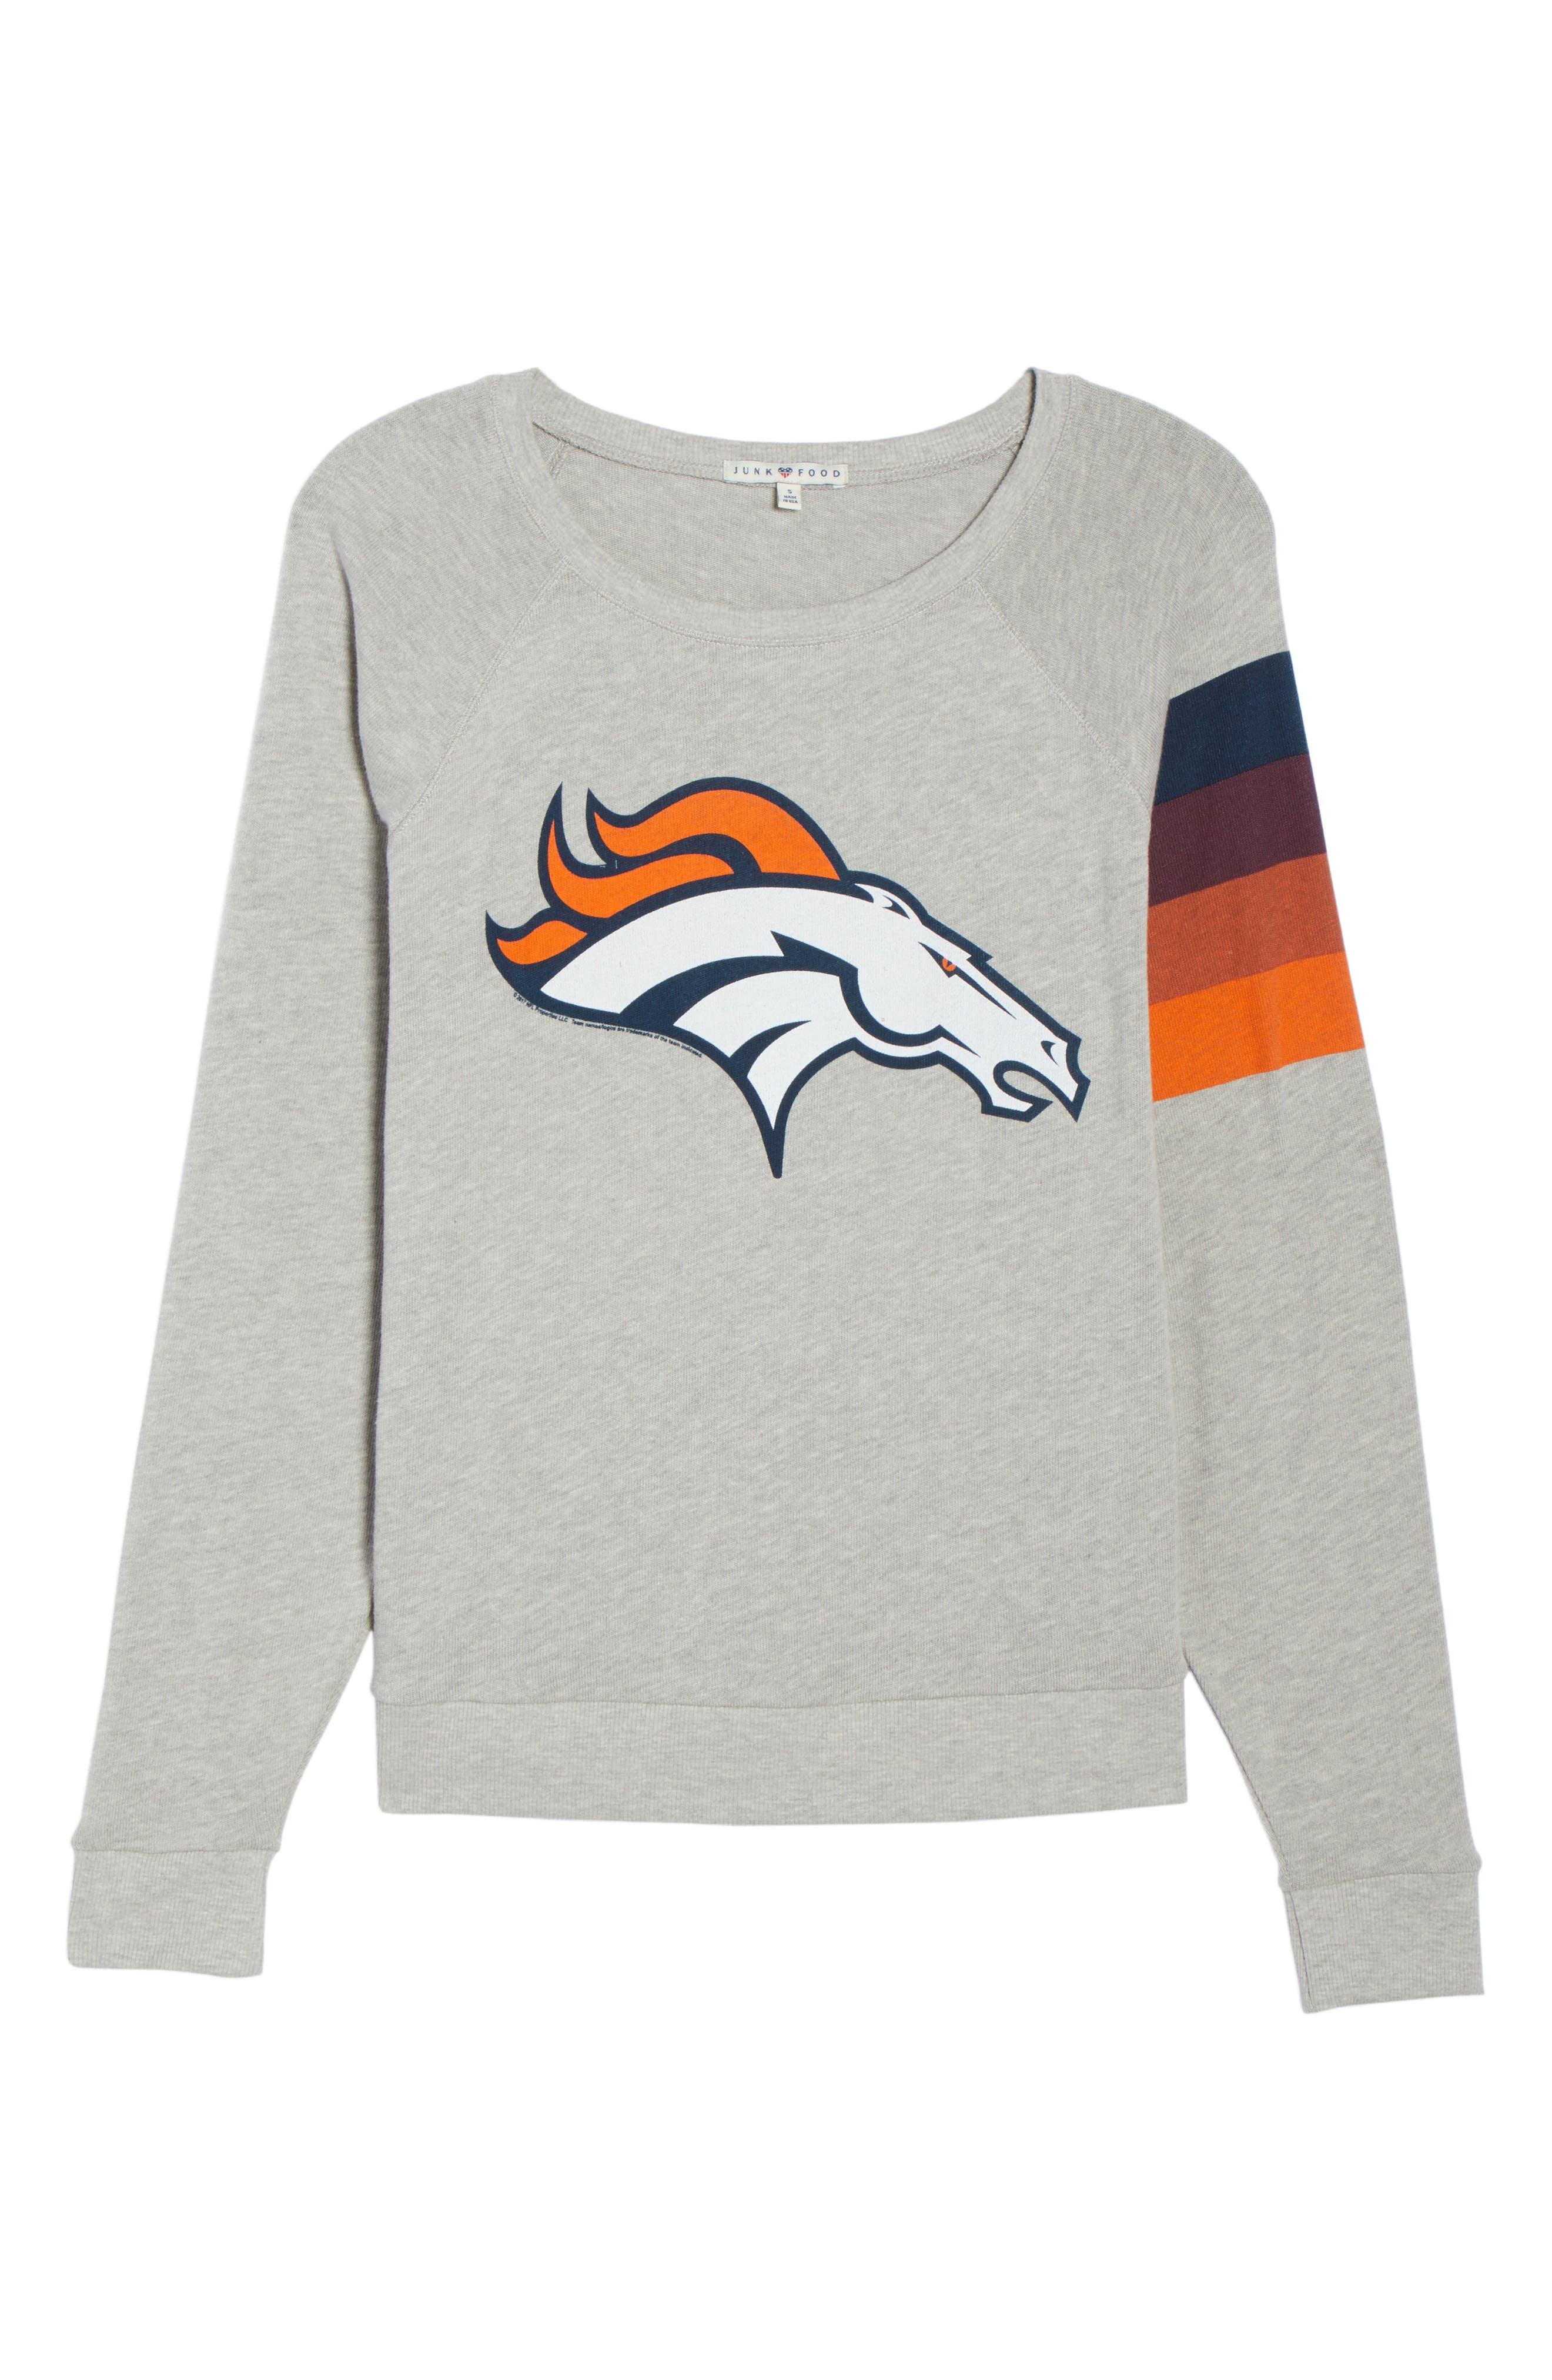 NFL Denver Broncos Hacci Sweatshirt,                             Alternate thumbnail 7, color,                             Dove Heather Grey